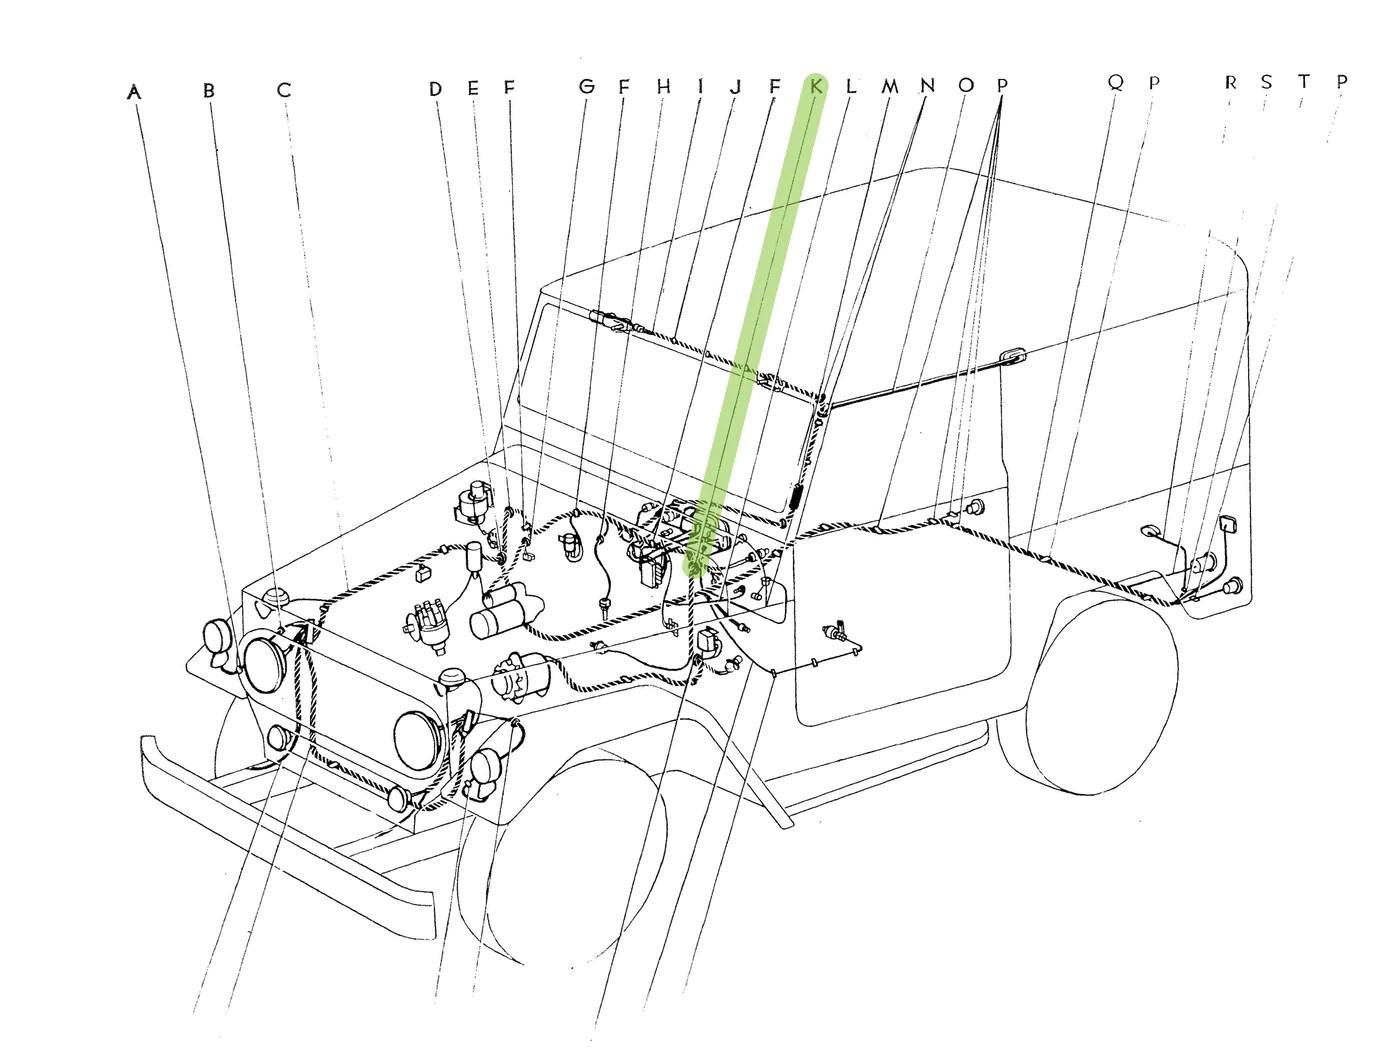 wiring diagram grommet key wiring diagram img firewall grommet wire harness oem fj40 fj45  [ 1400 x 1053 Pixel ]